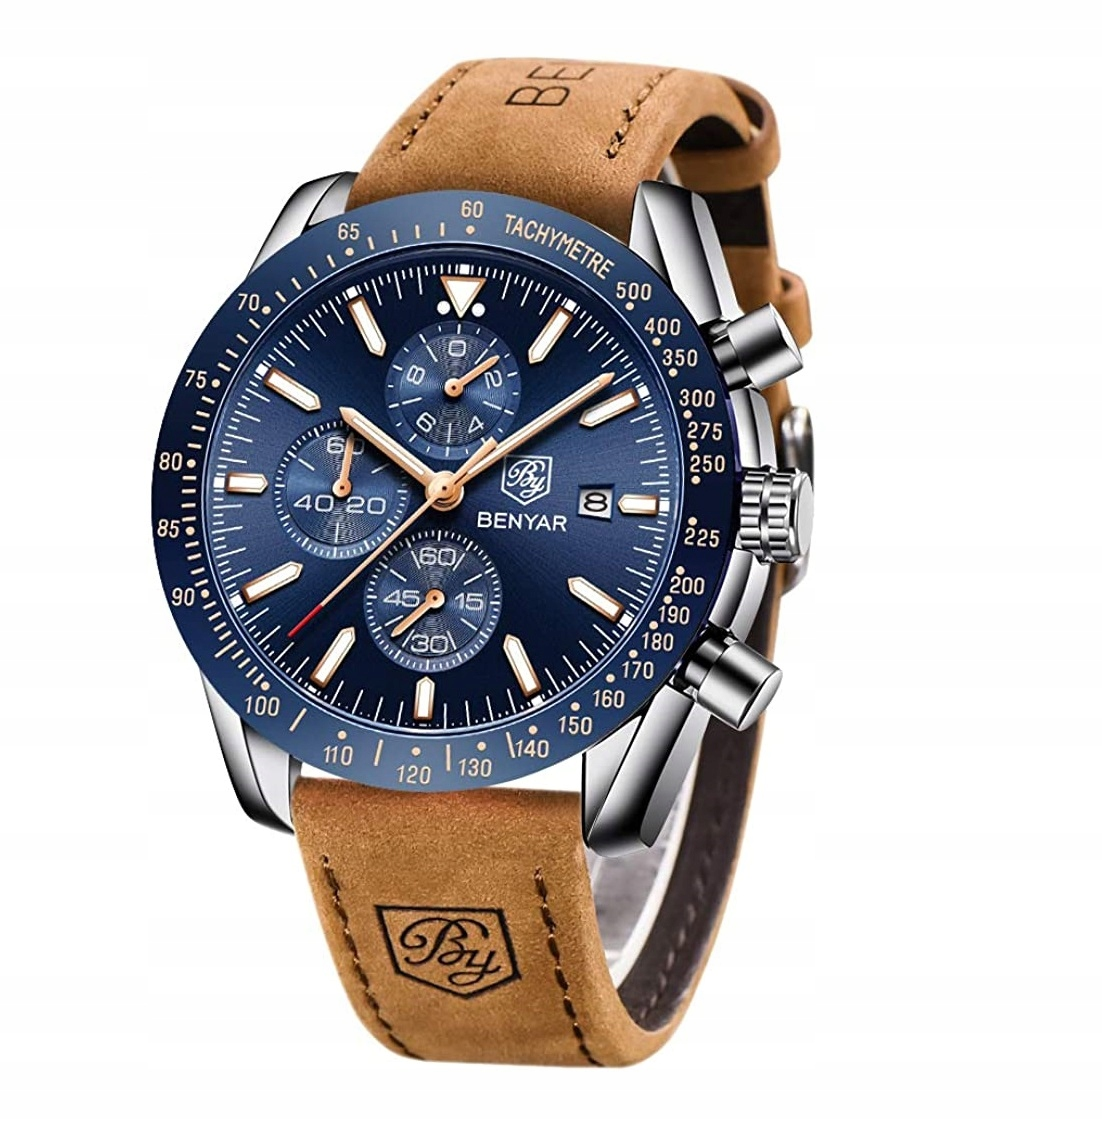 Zegarek Męski Klasyczny Benyar Chronograf +Pudełko